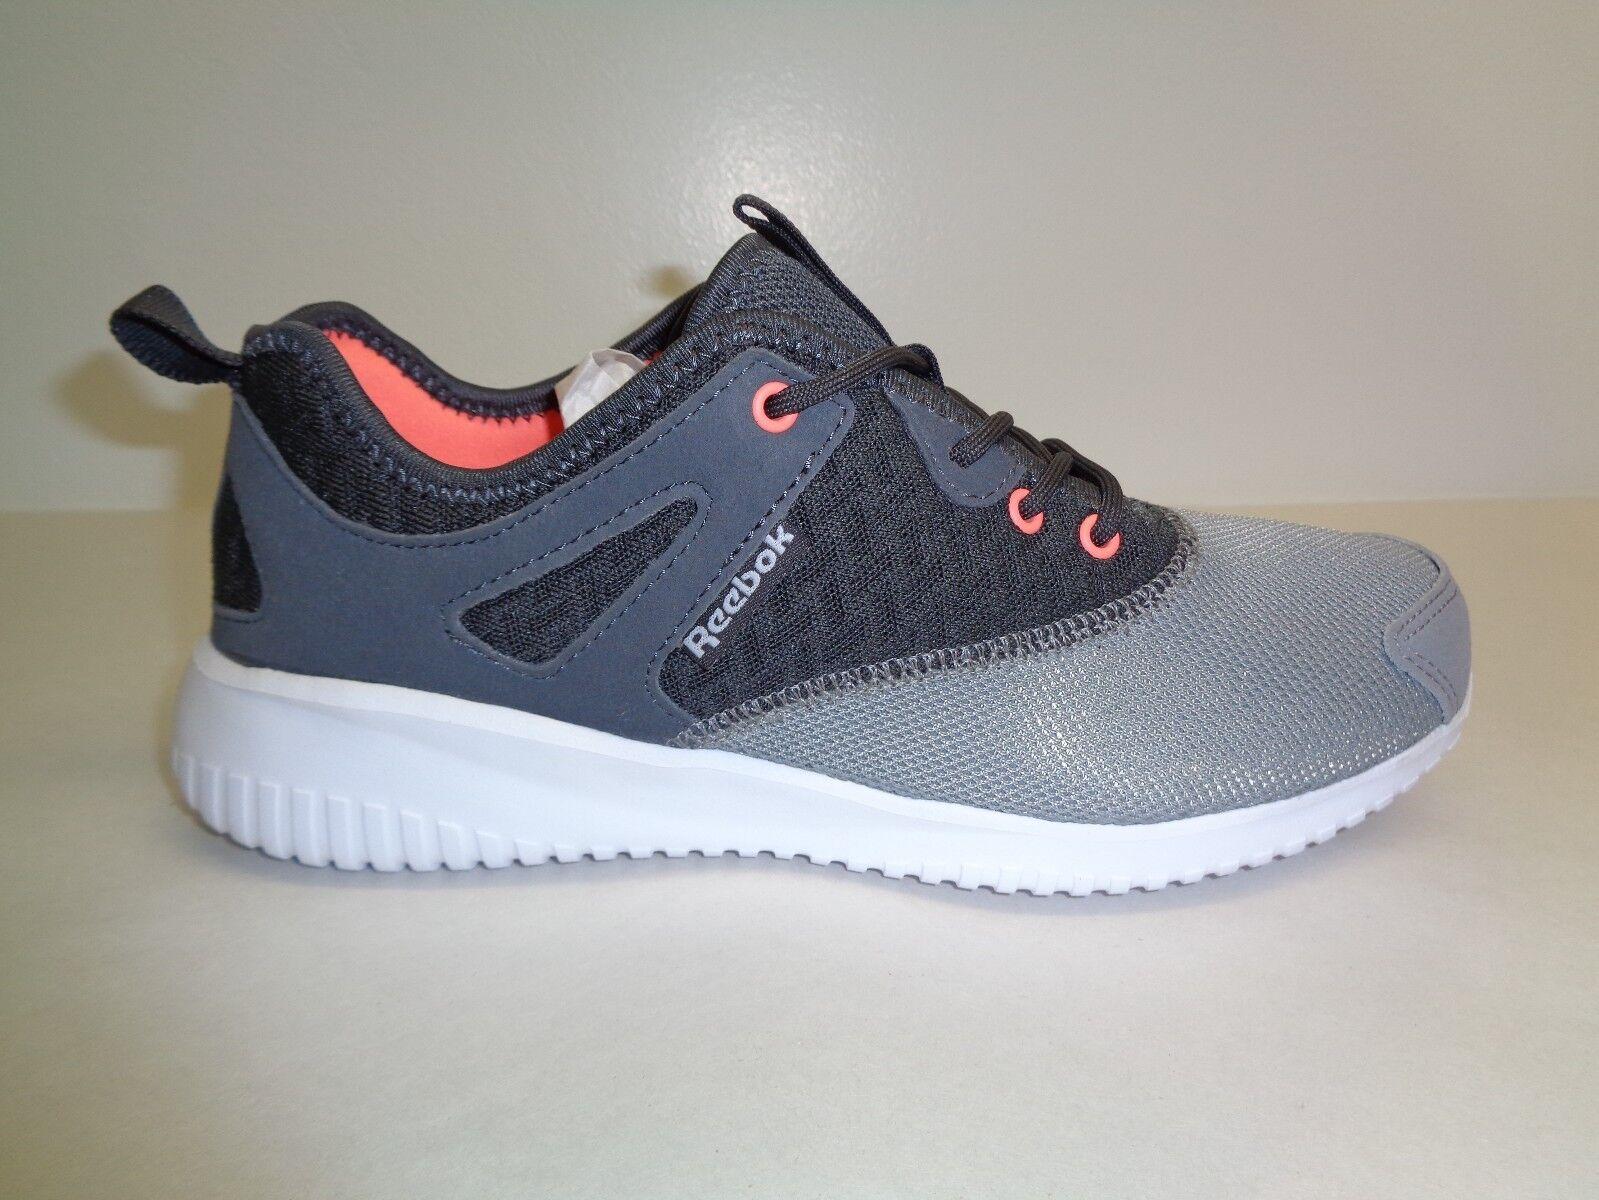 Reebok Größe 10 M STYLESCAPE 2.0 ARCH Gray Training Sneakers NEU Damenschuhe Schuhes